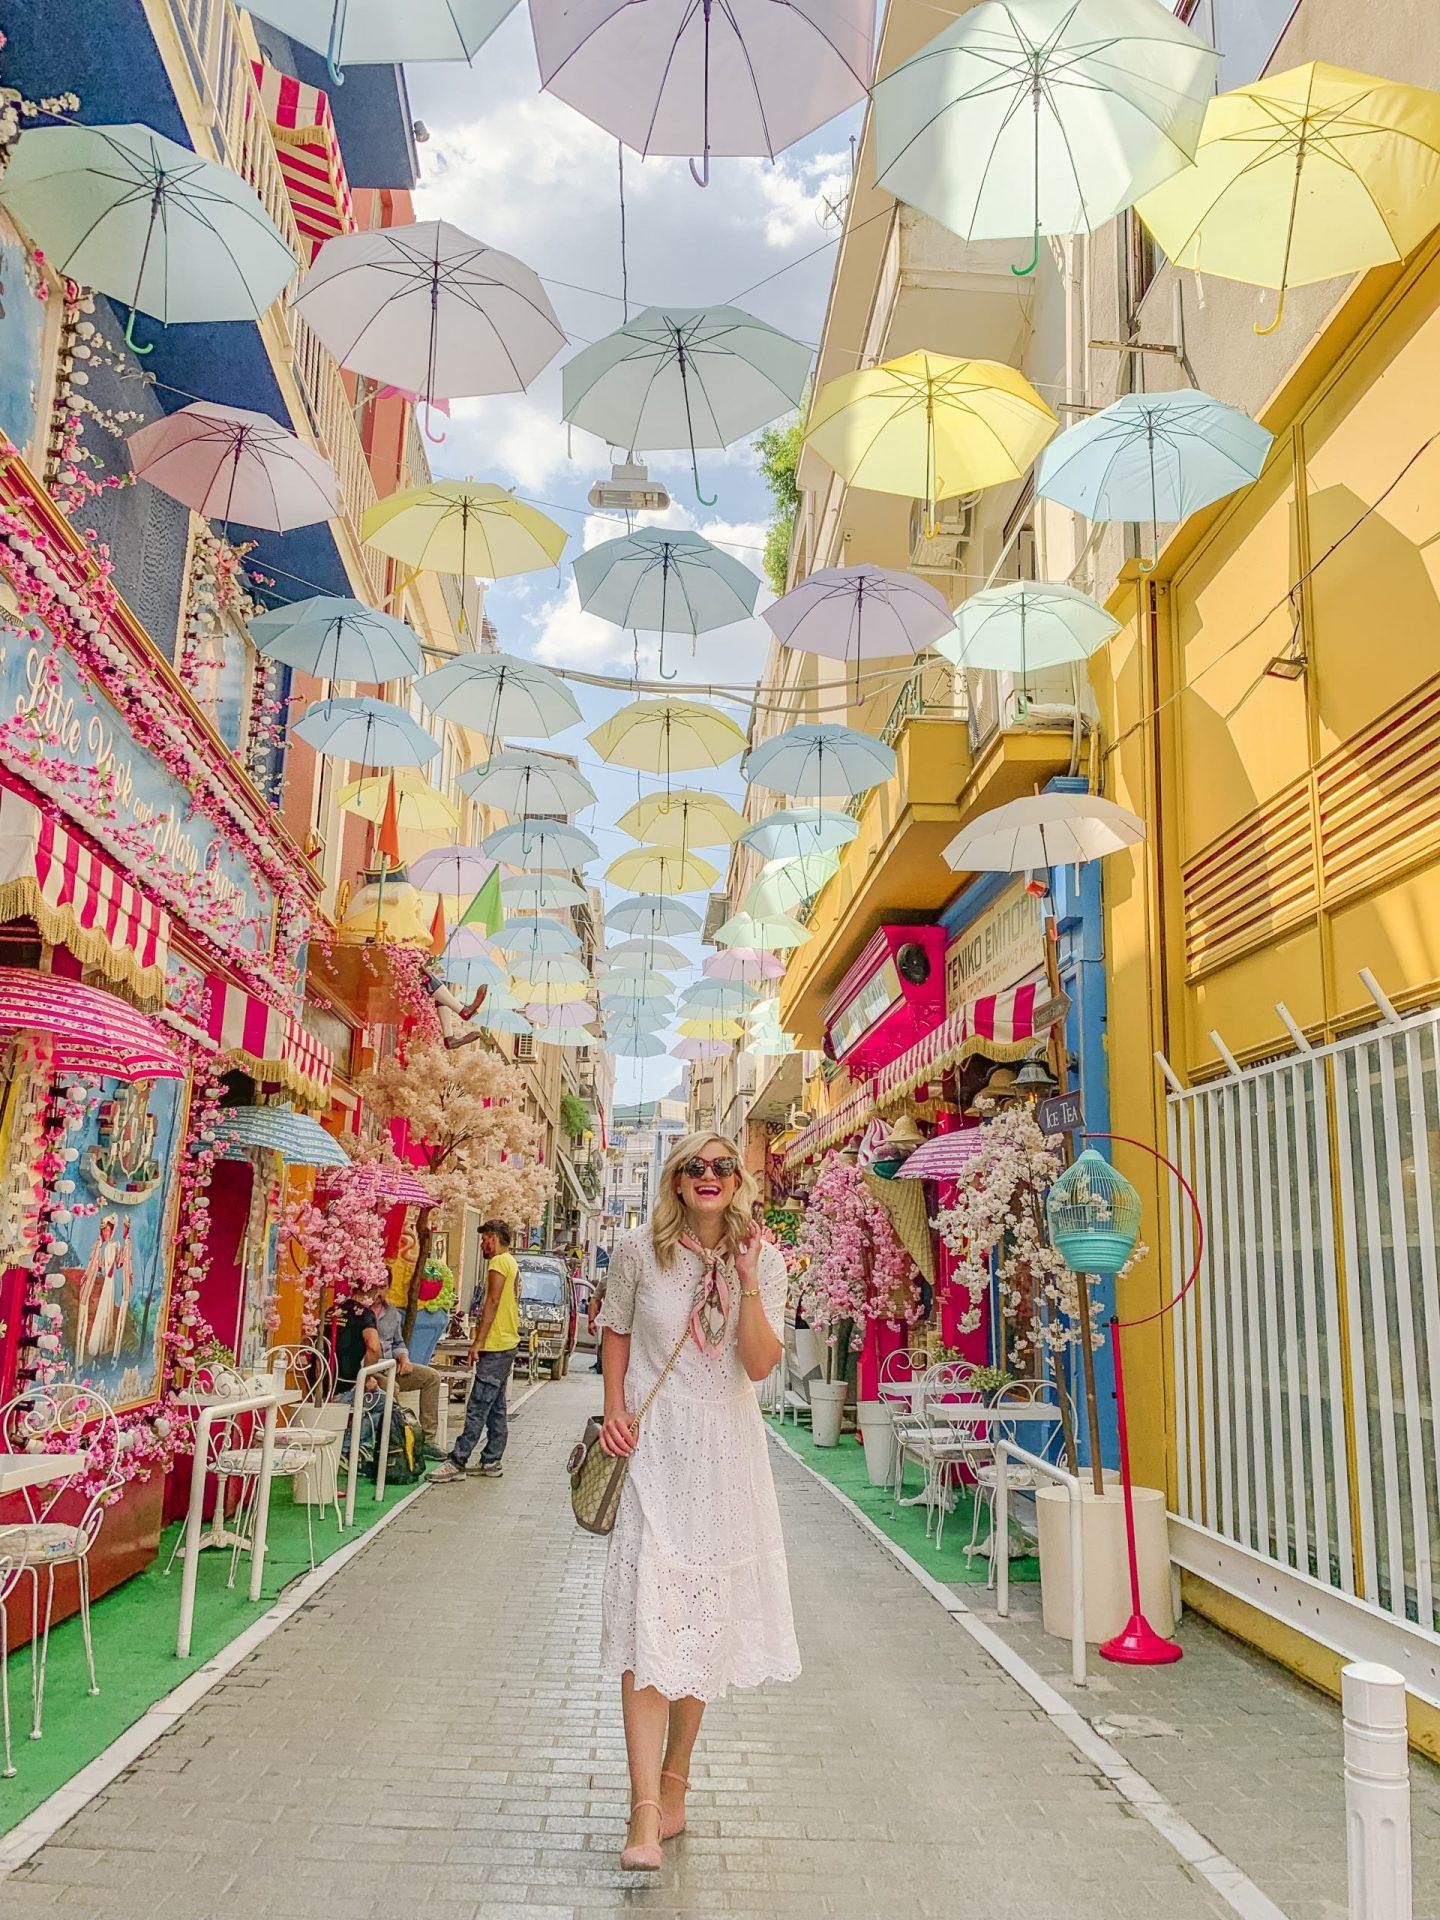 Bijuleni-Athens-Greece-Alleway with Colourful Umbrellas